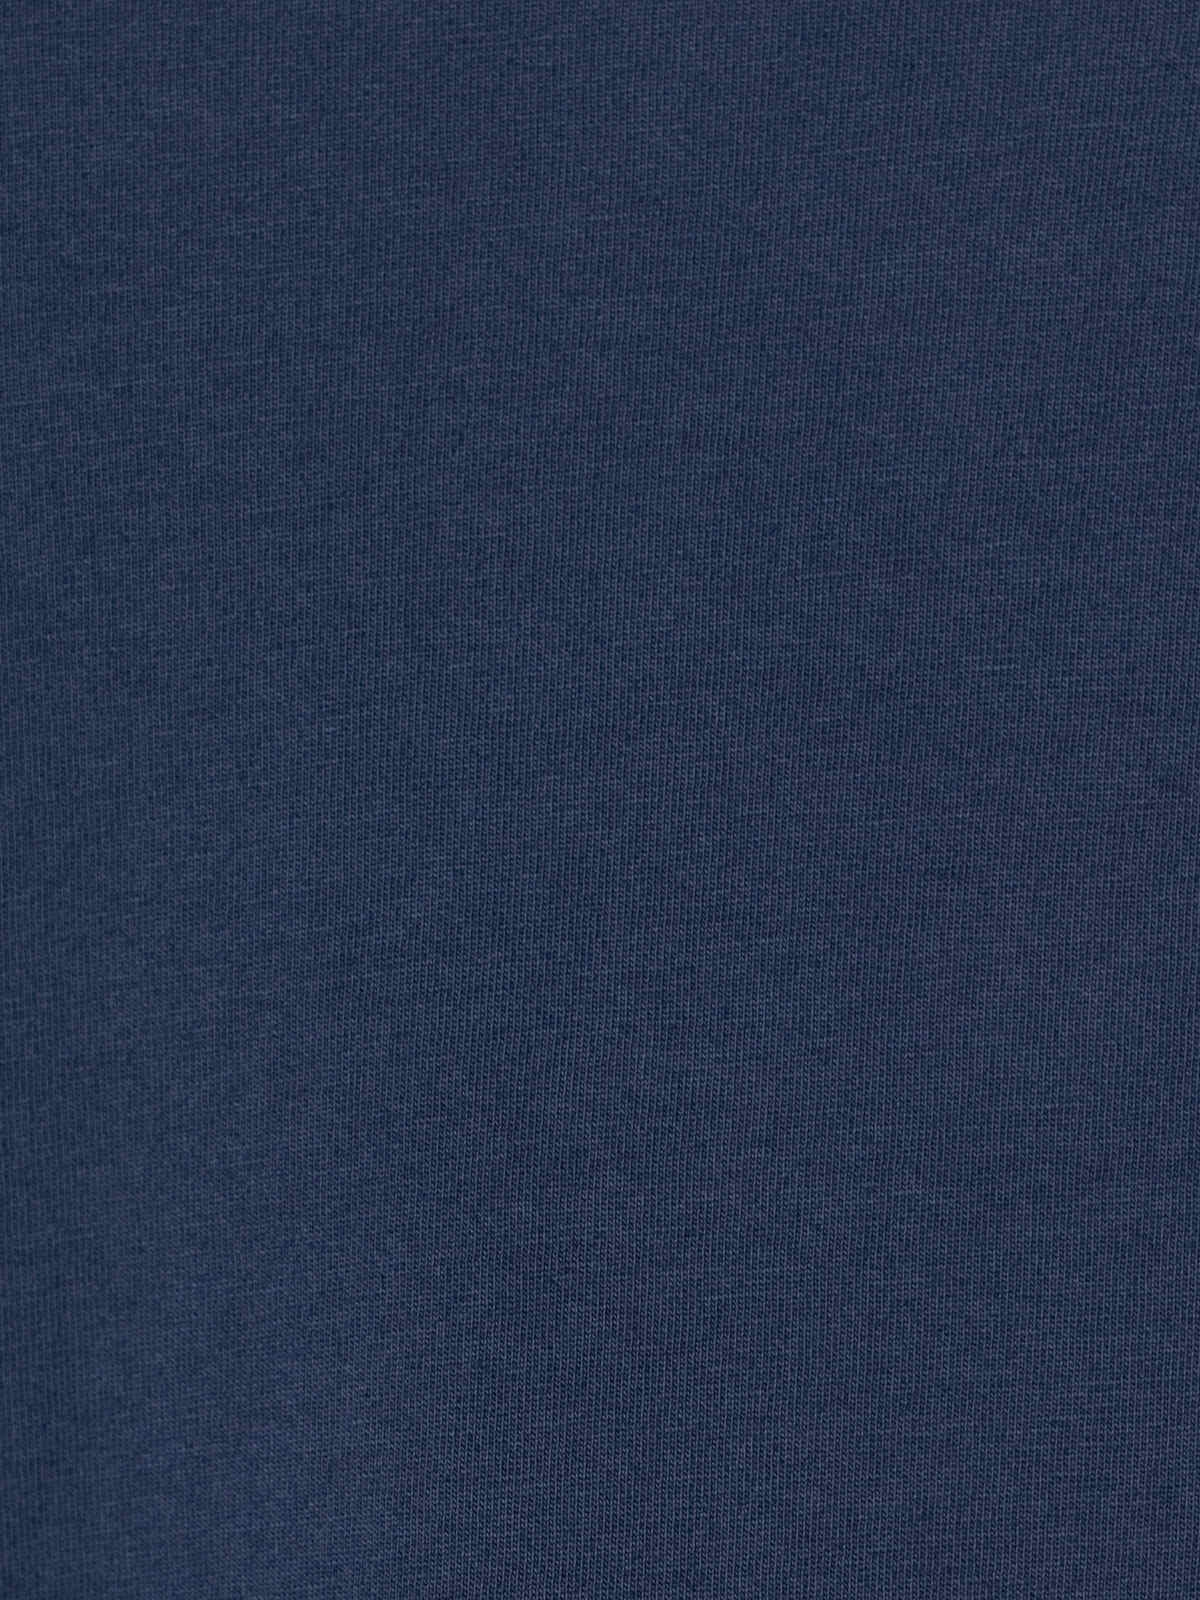 Camiseta mujer algodón lisa cuello pico Azul Marino